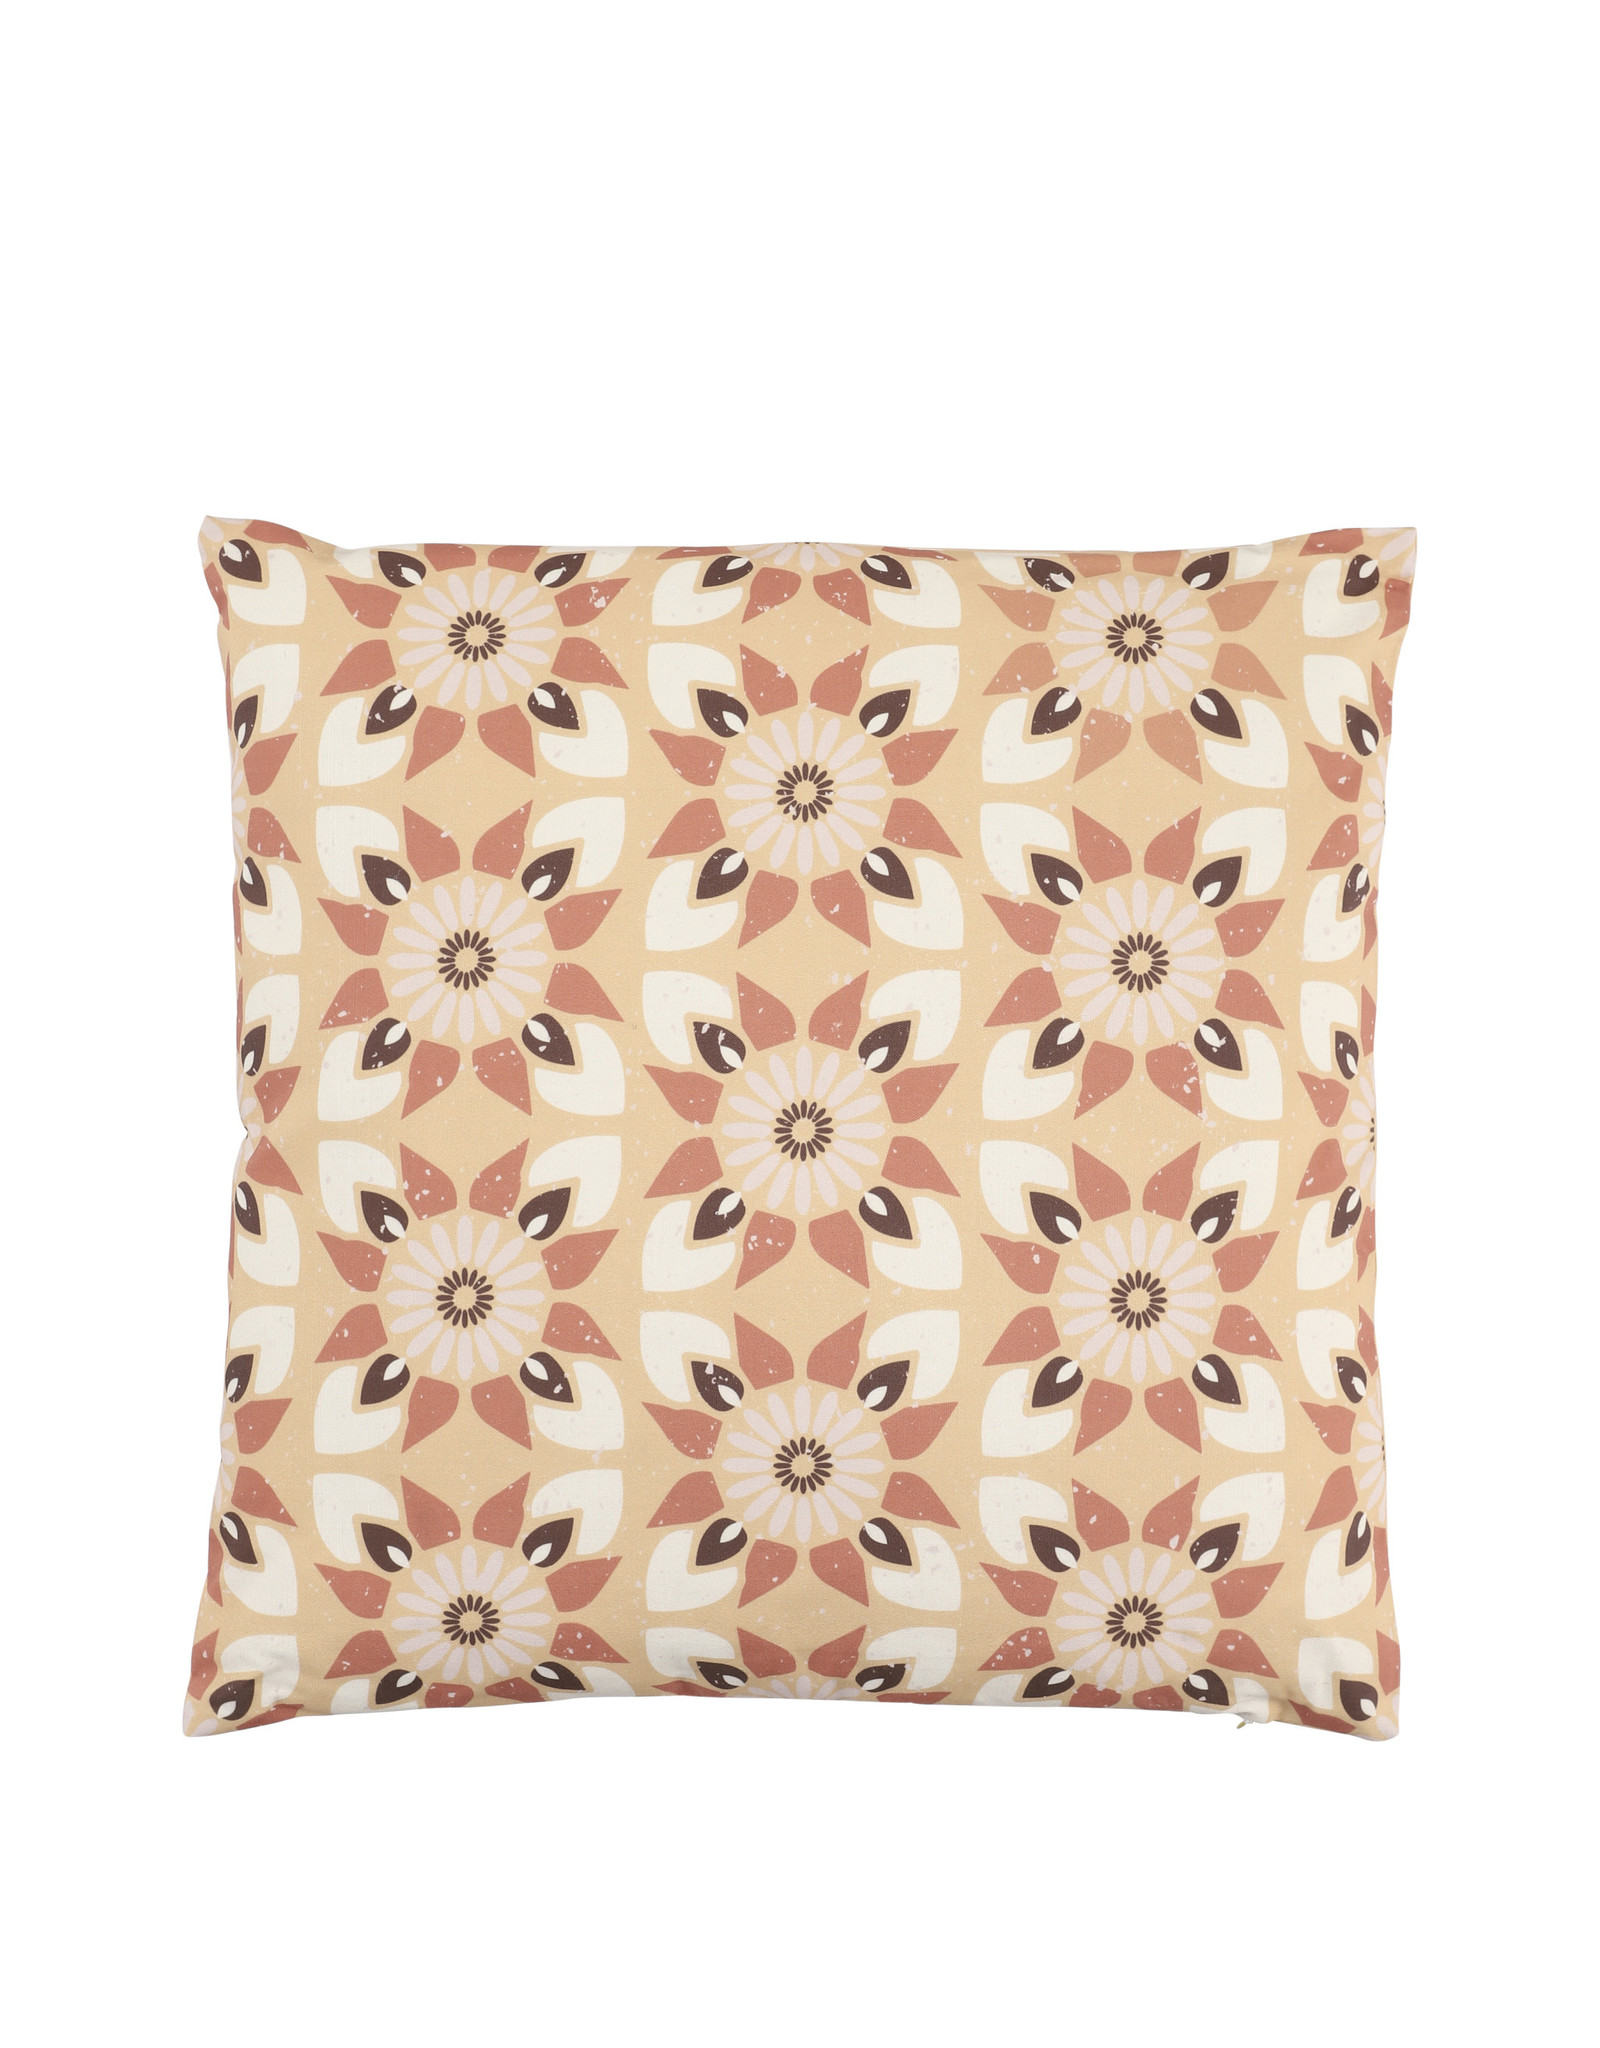 Mica Canea - Outdoor Pillow - Brown - l45xw45cm